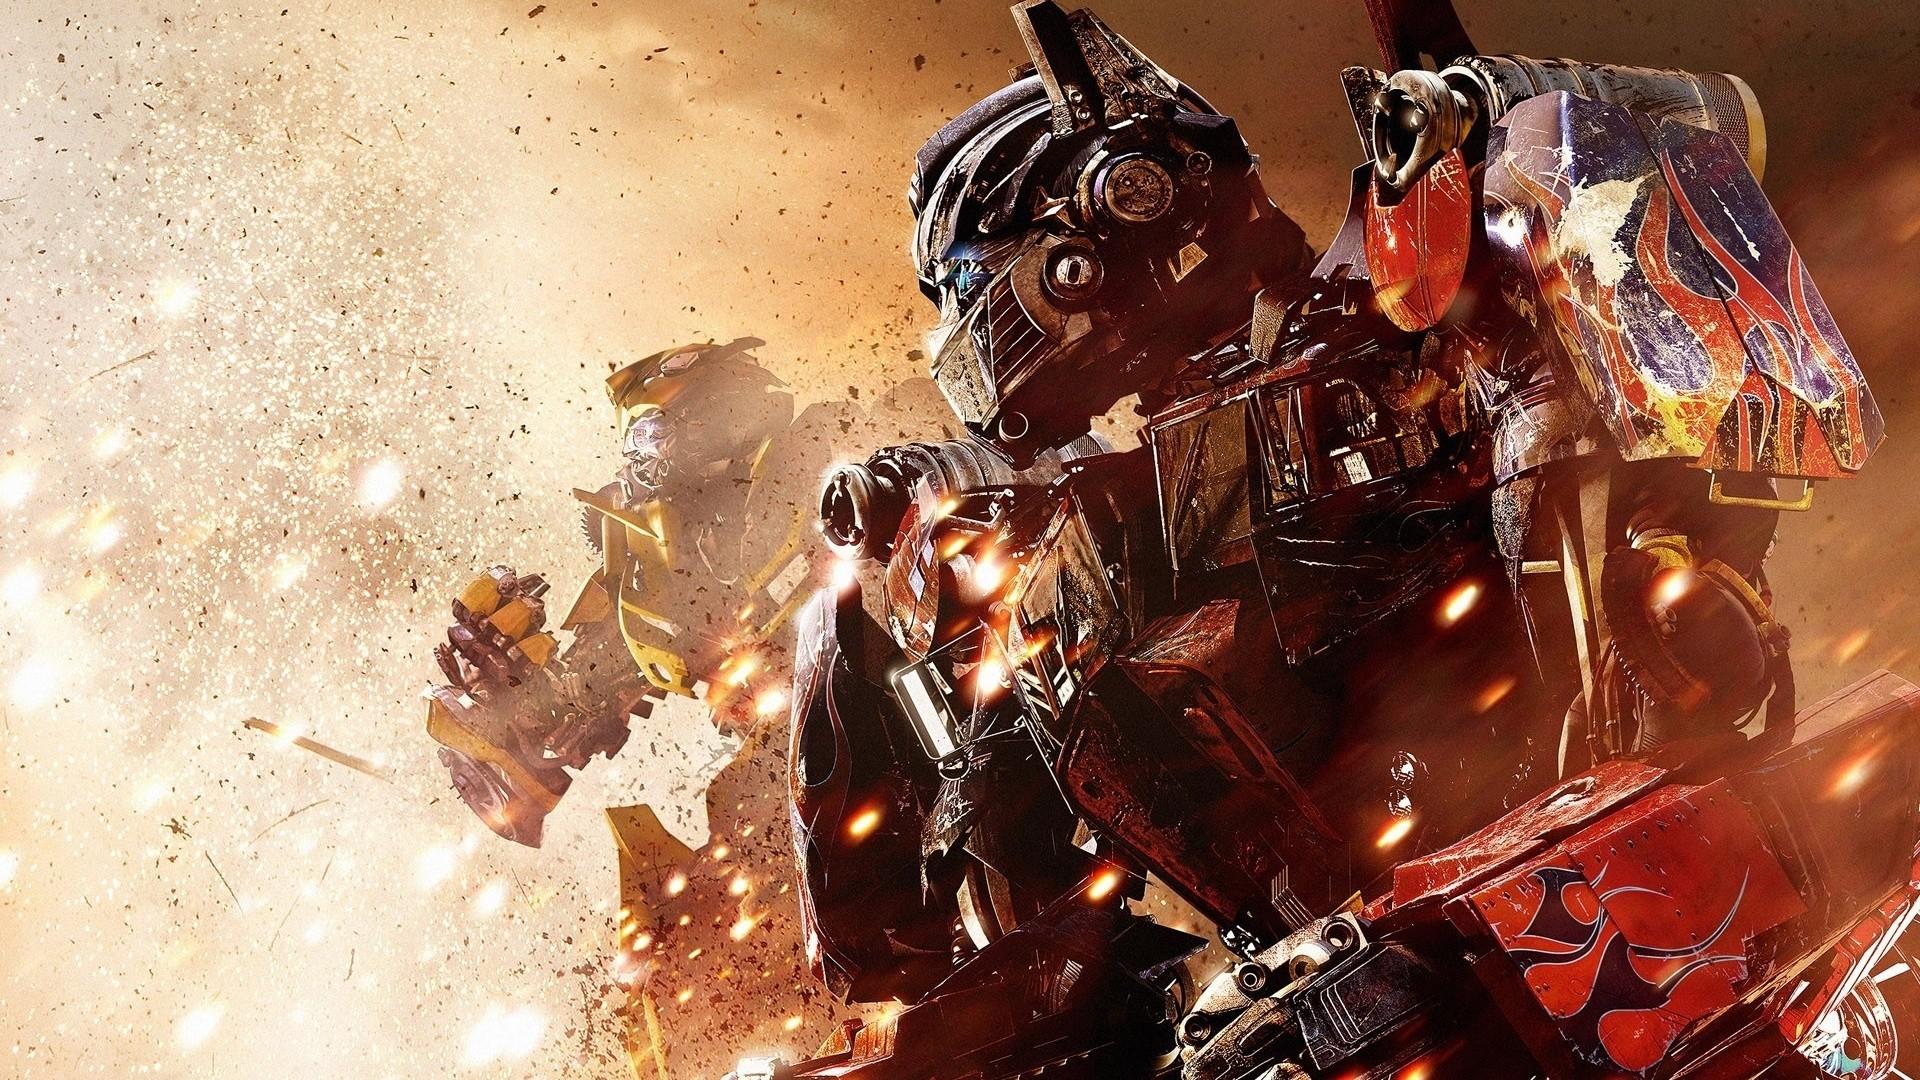 Transformers prime wallpaper hd wallpapersafari - Transformers prime wallpaper ...